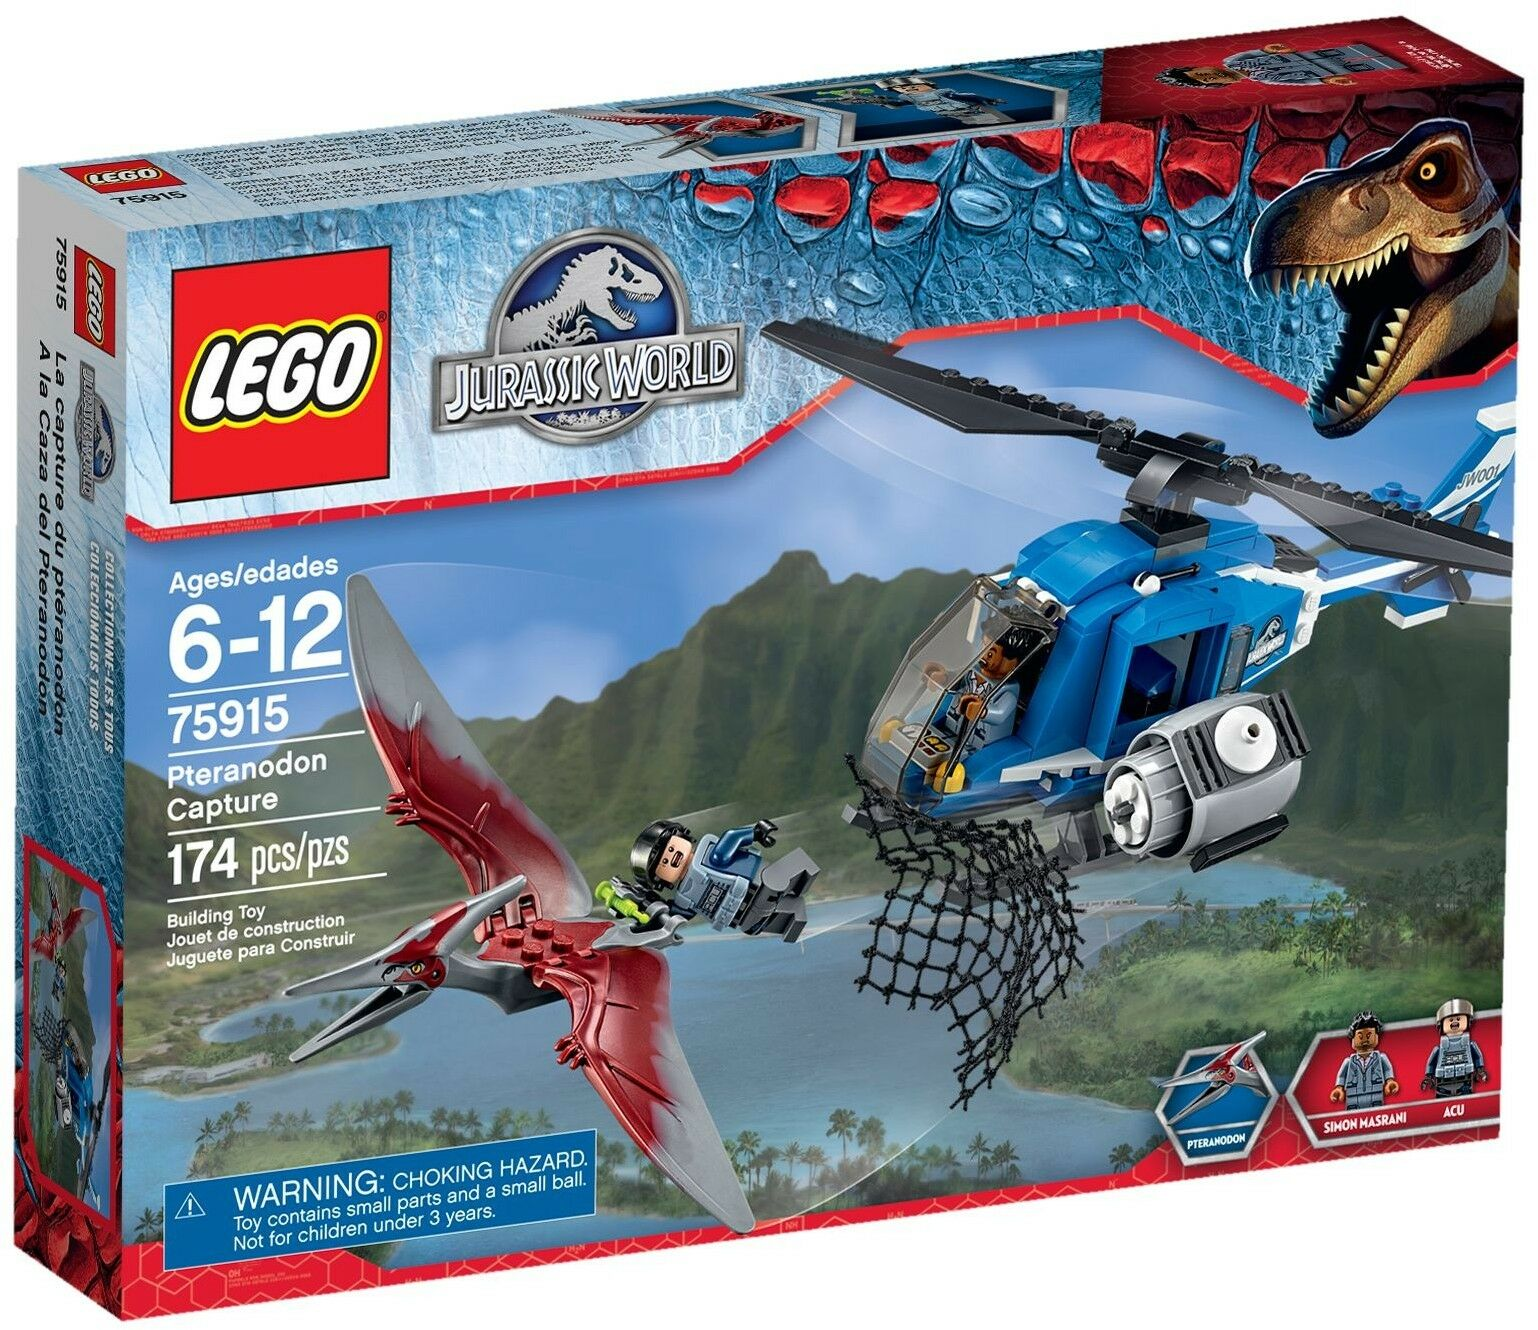 Lego Jurassic Jurassic Jurassic World 75915-Pteranodon Capture  New & Sealed  Shelf Wear e782ac